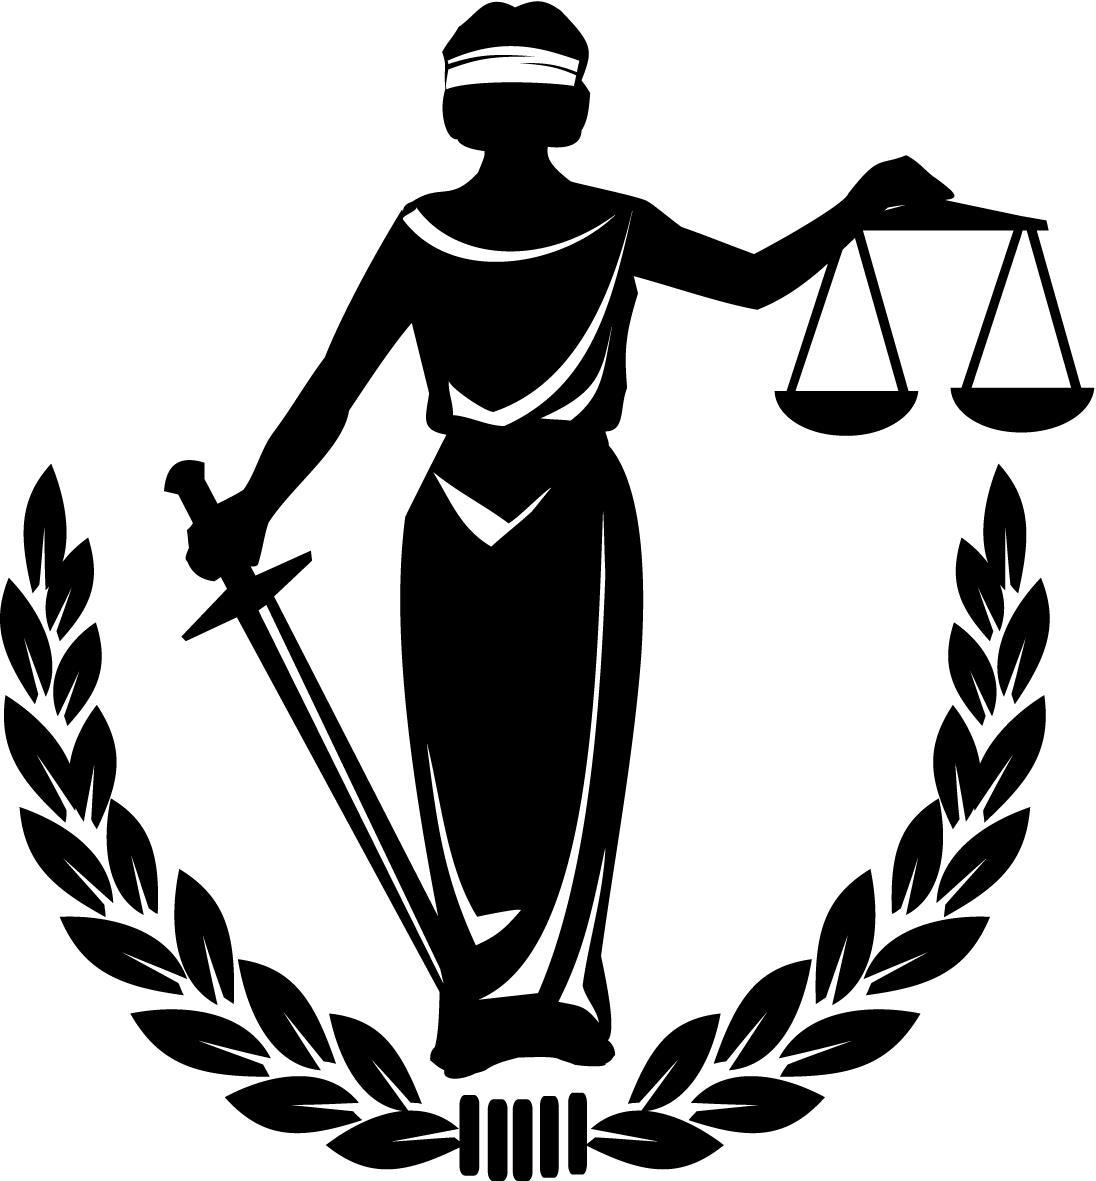 http://www.guilhembertholet.com/blog/wp-content/uploads/2011/06/justice.jpg